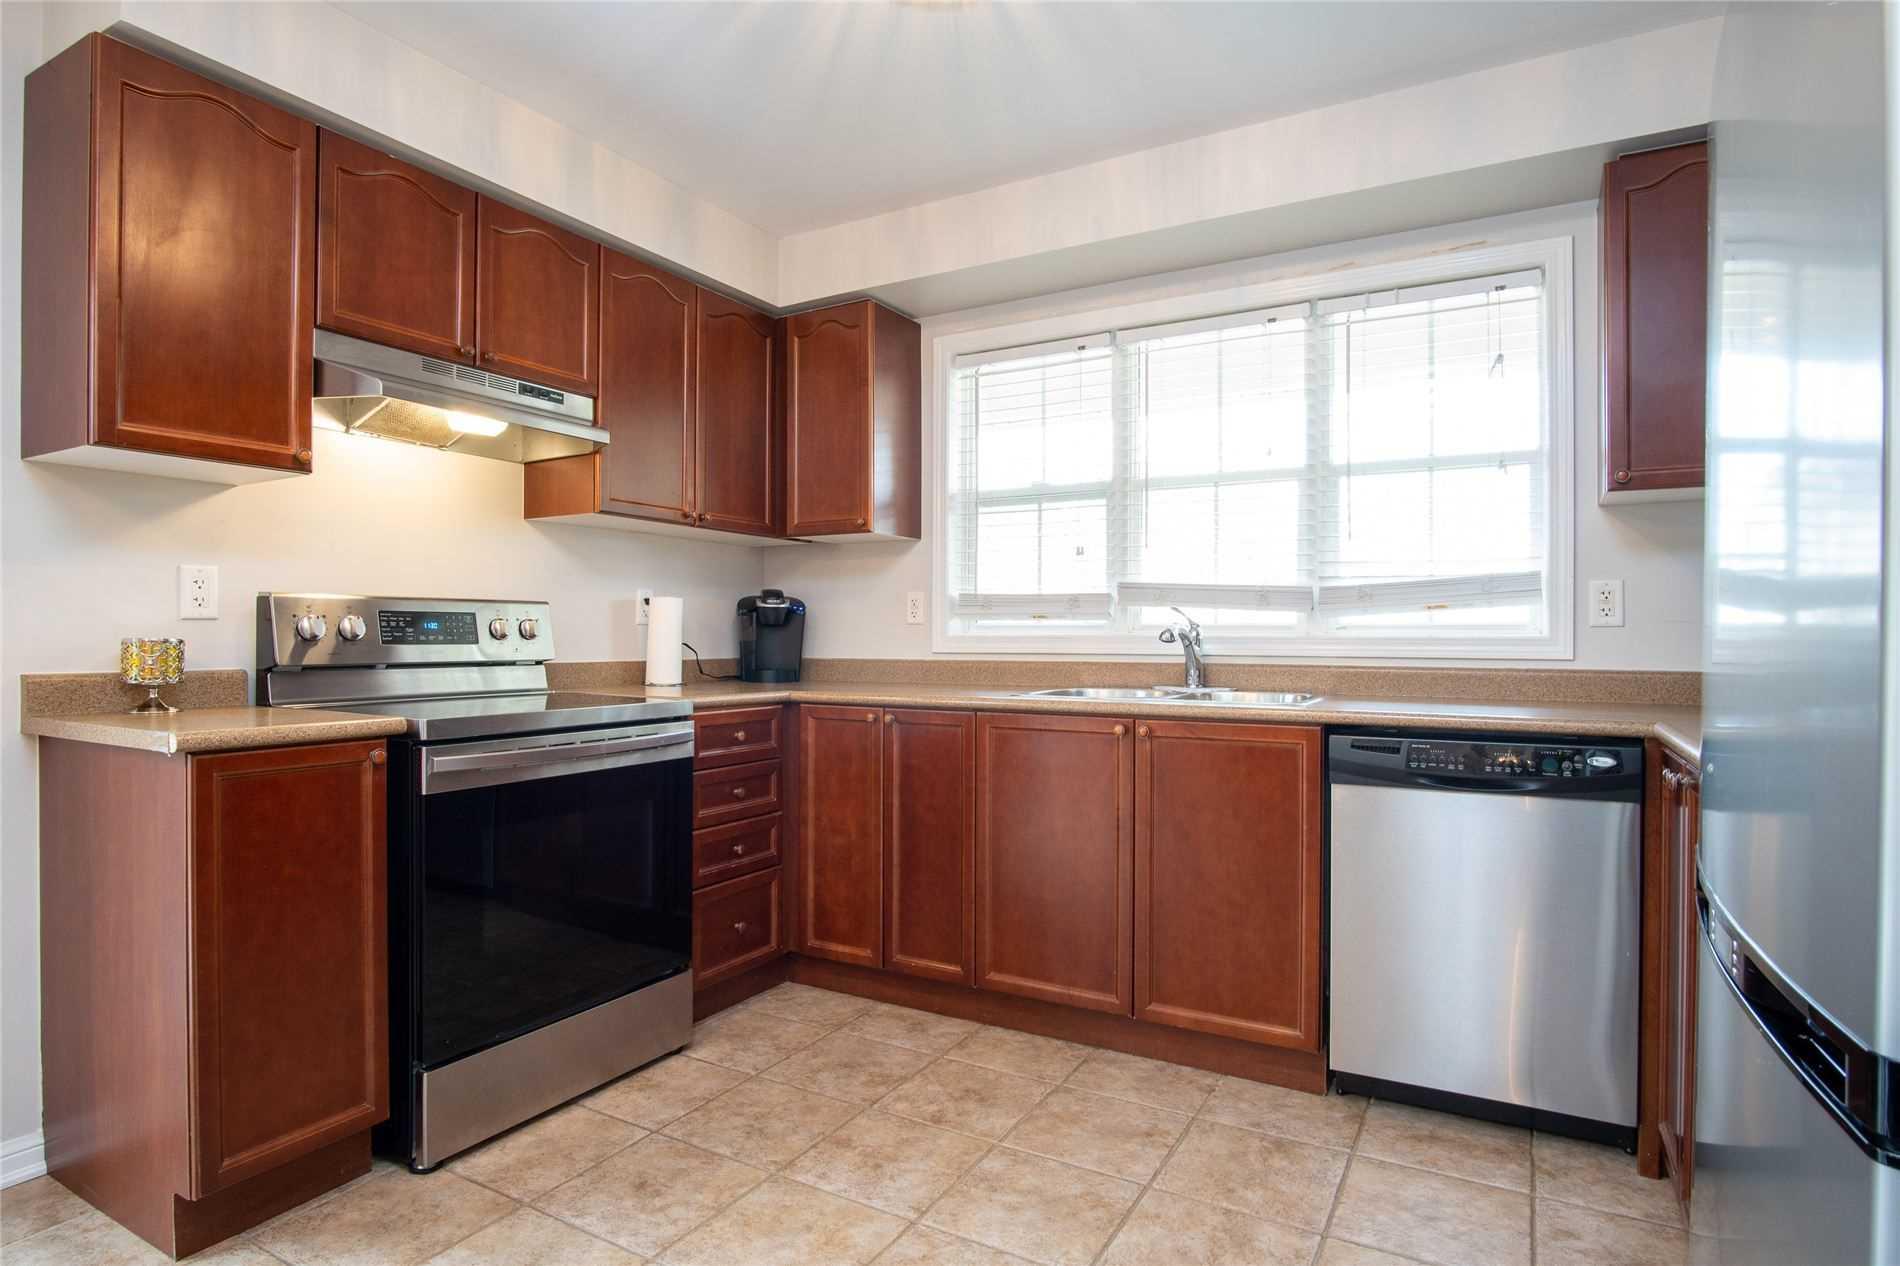 827 Biggar Hts - Coates Detached for sale, 4 Bedrooms (W5400280) - #10